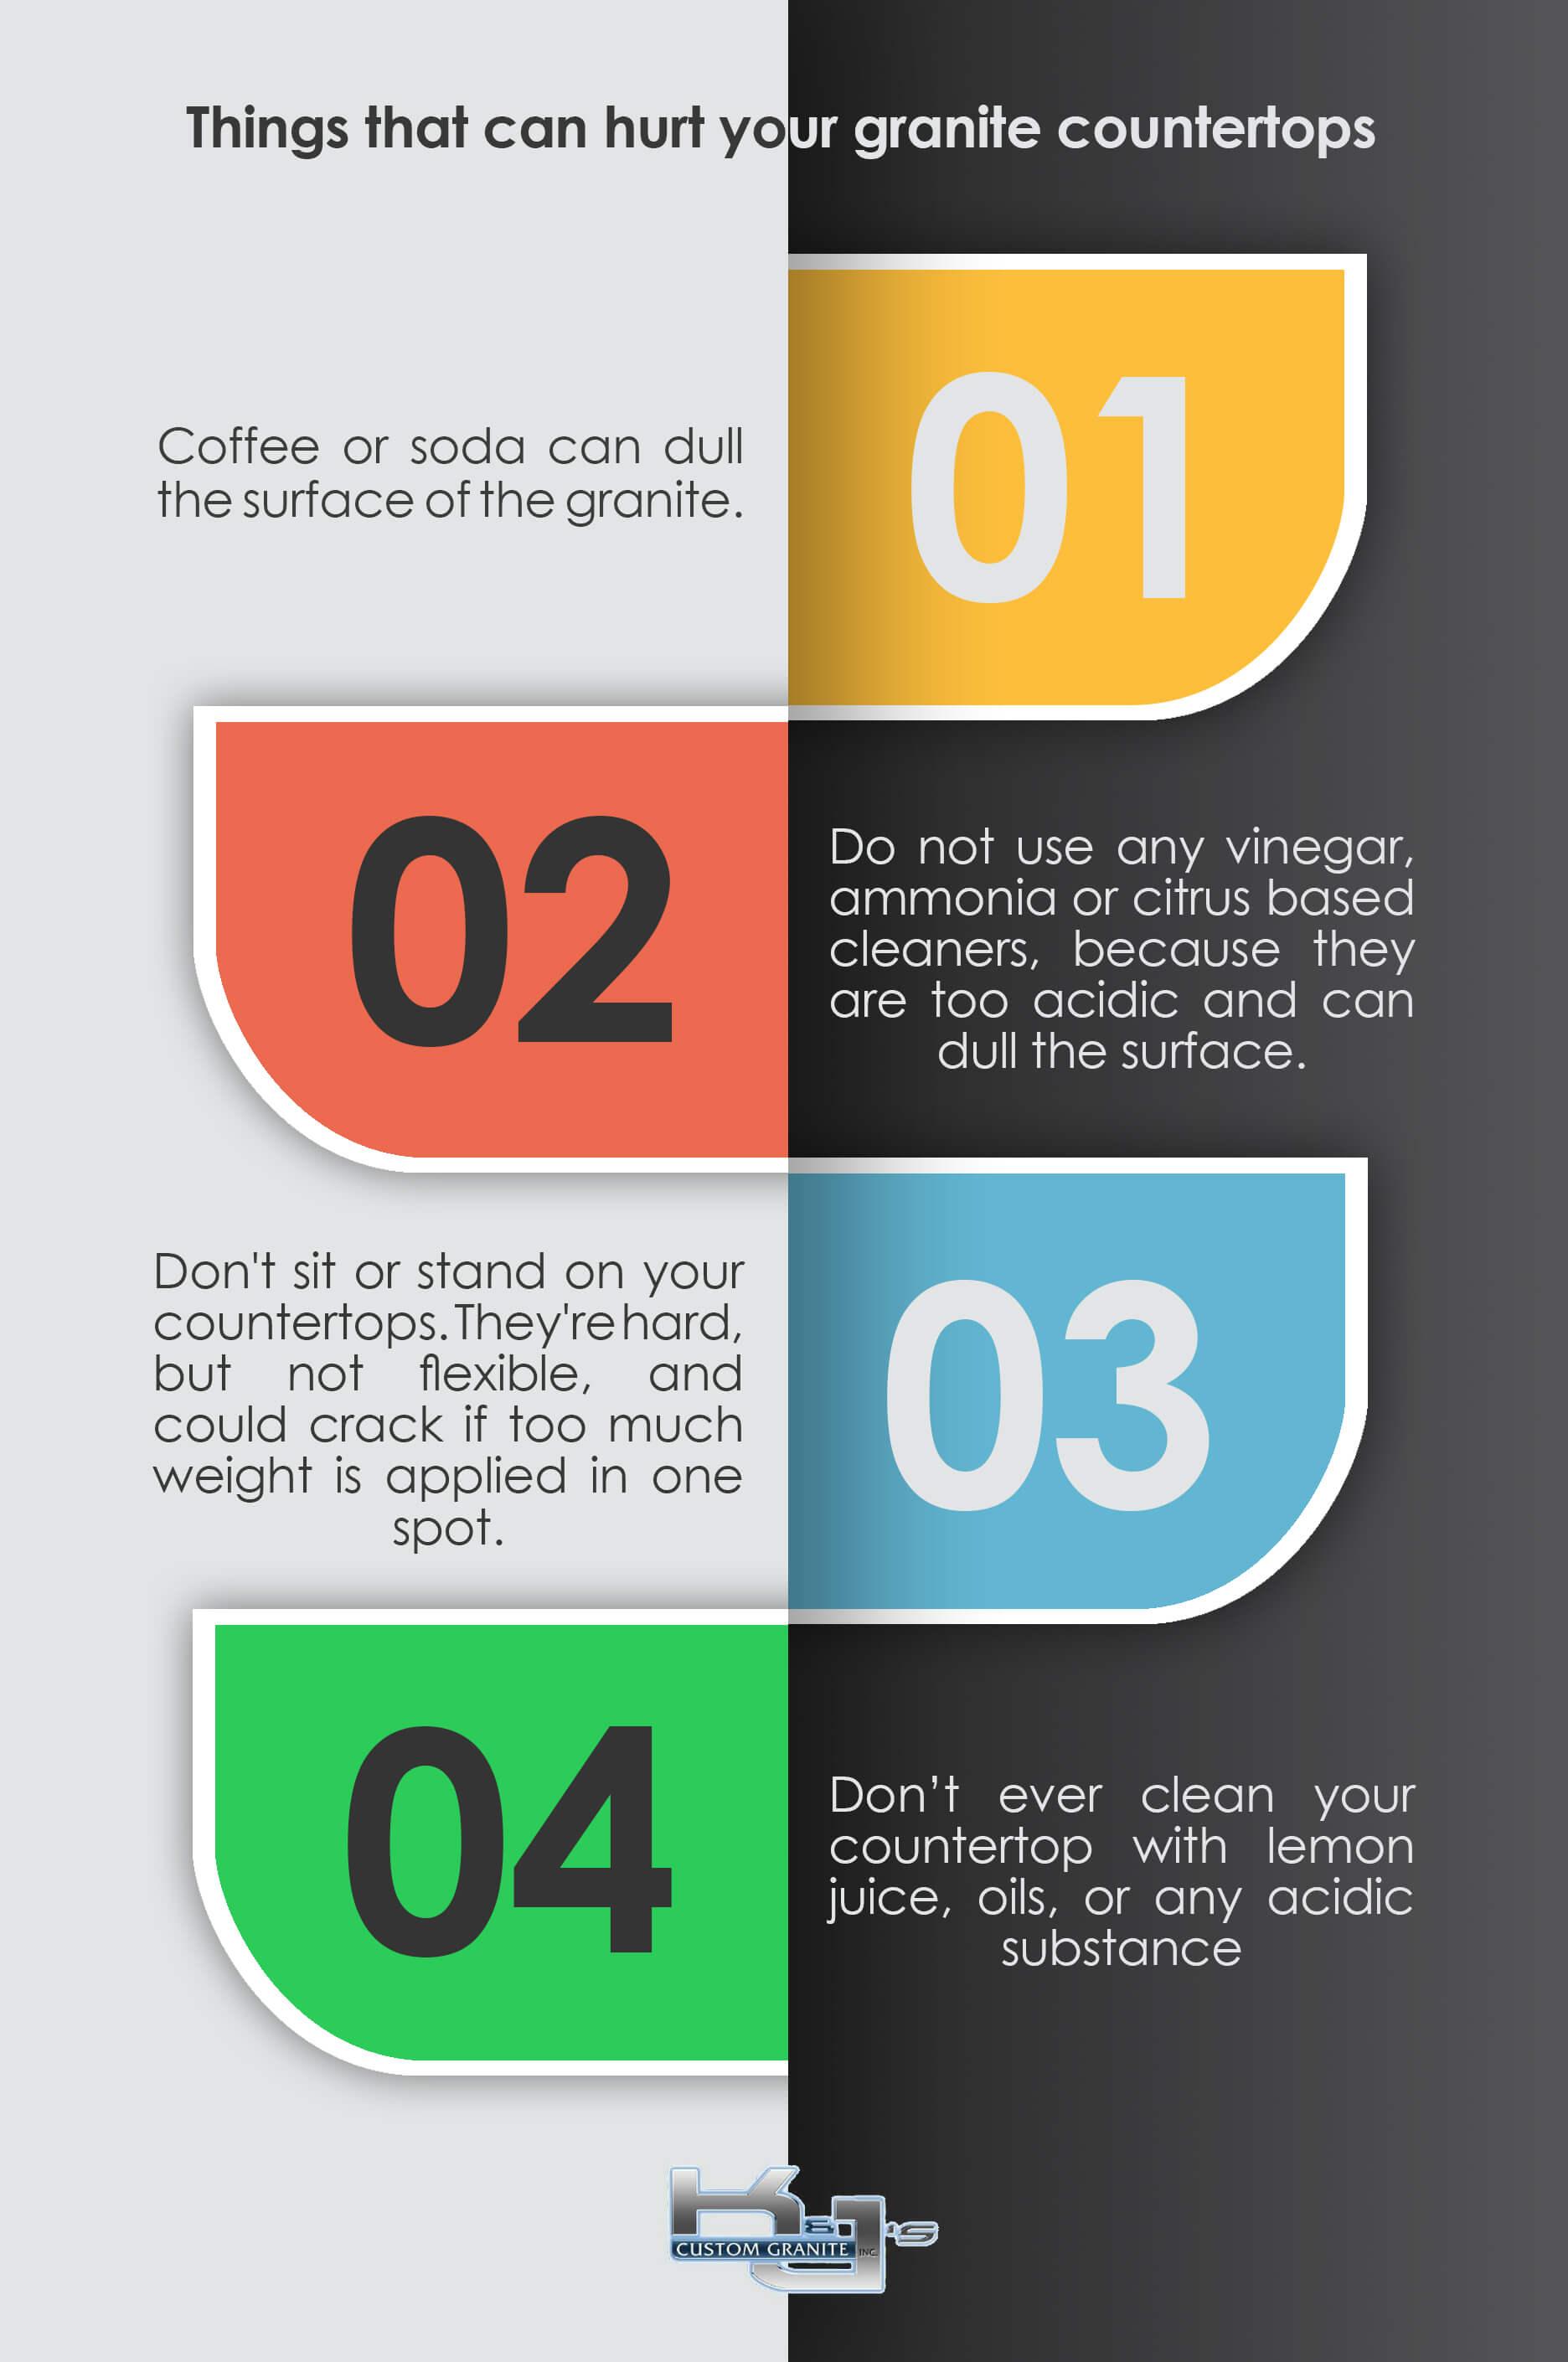 Things that can hurt your granite countertops